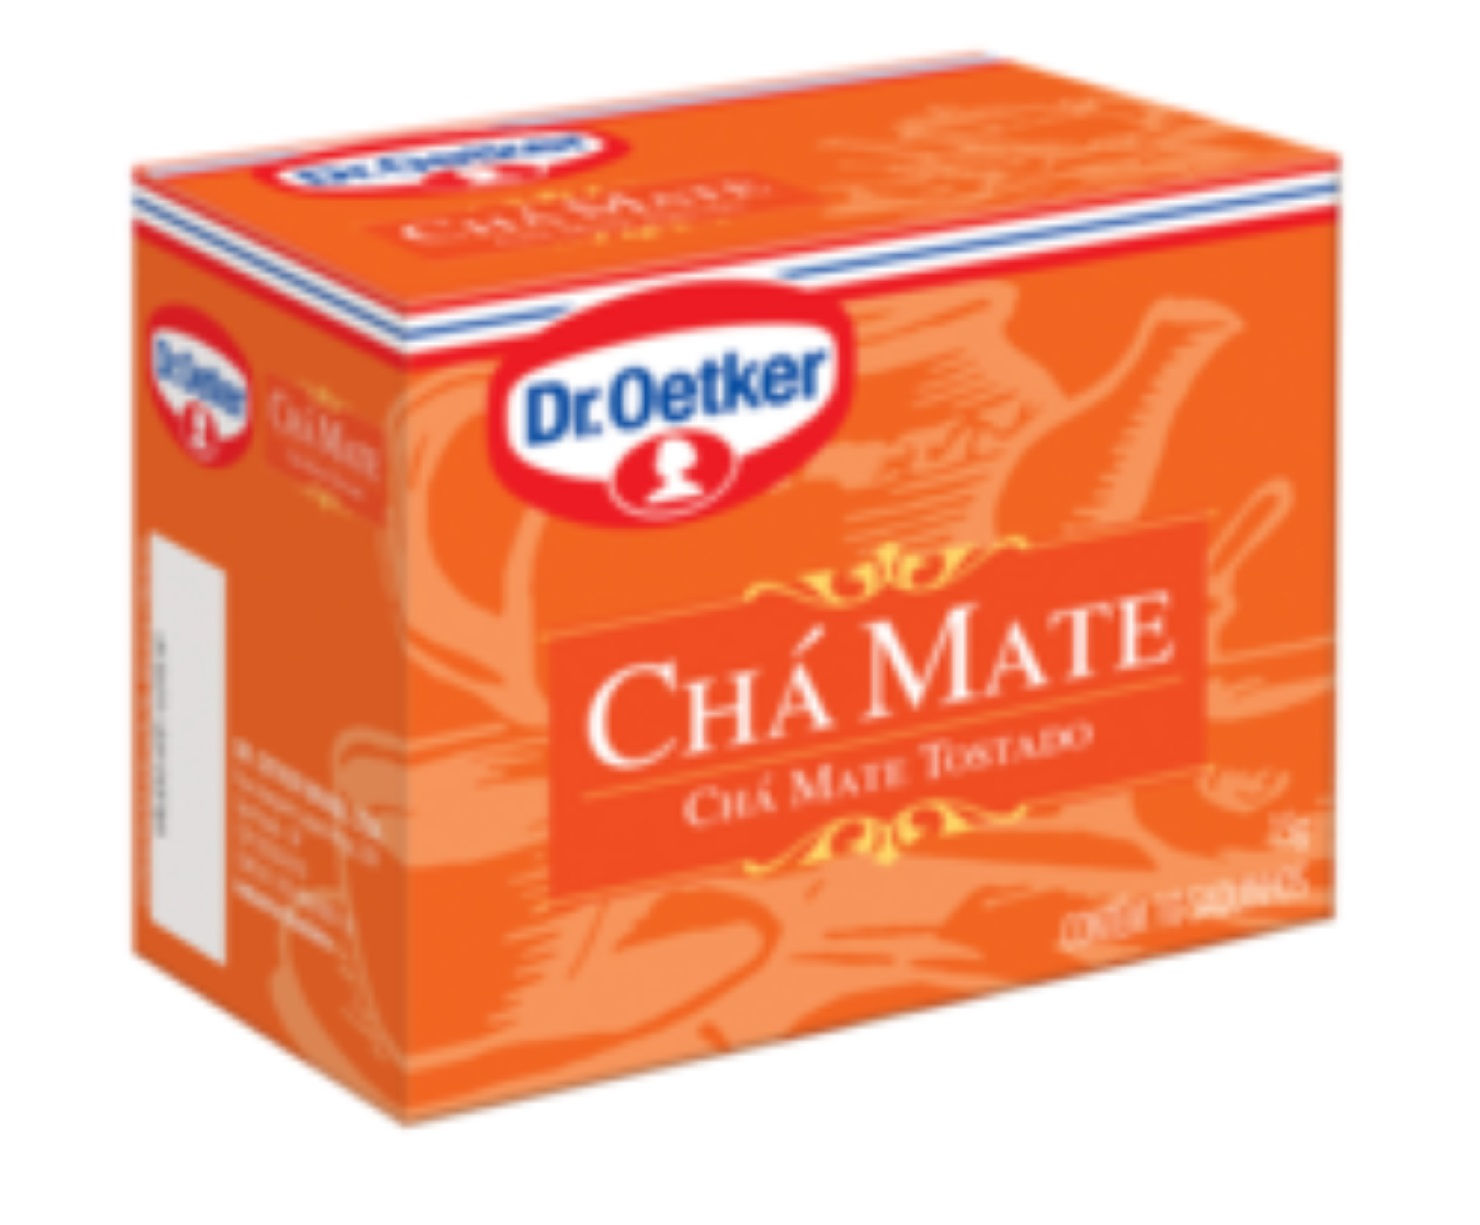 CHÁ MATE DR. OETKER KIT  C/ 2 UNIDADES